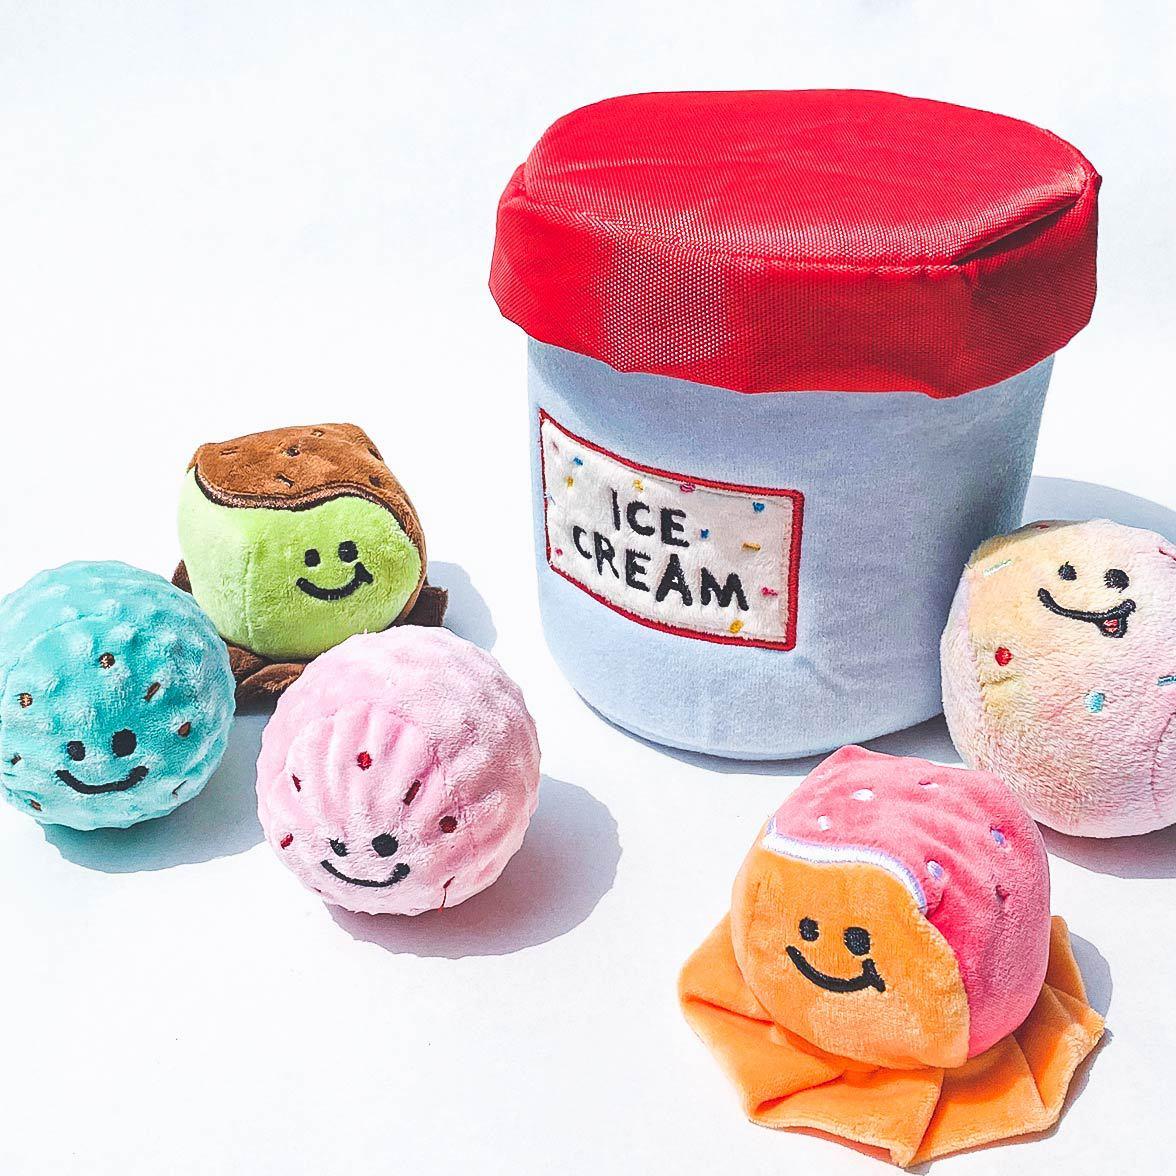 Cubo de helado para perro, bola luminosa BB, llamada comercial Exterior, juguete Vocal para mascota, divertido juguete de entrenamiento